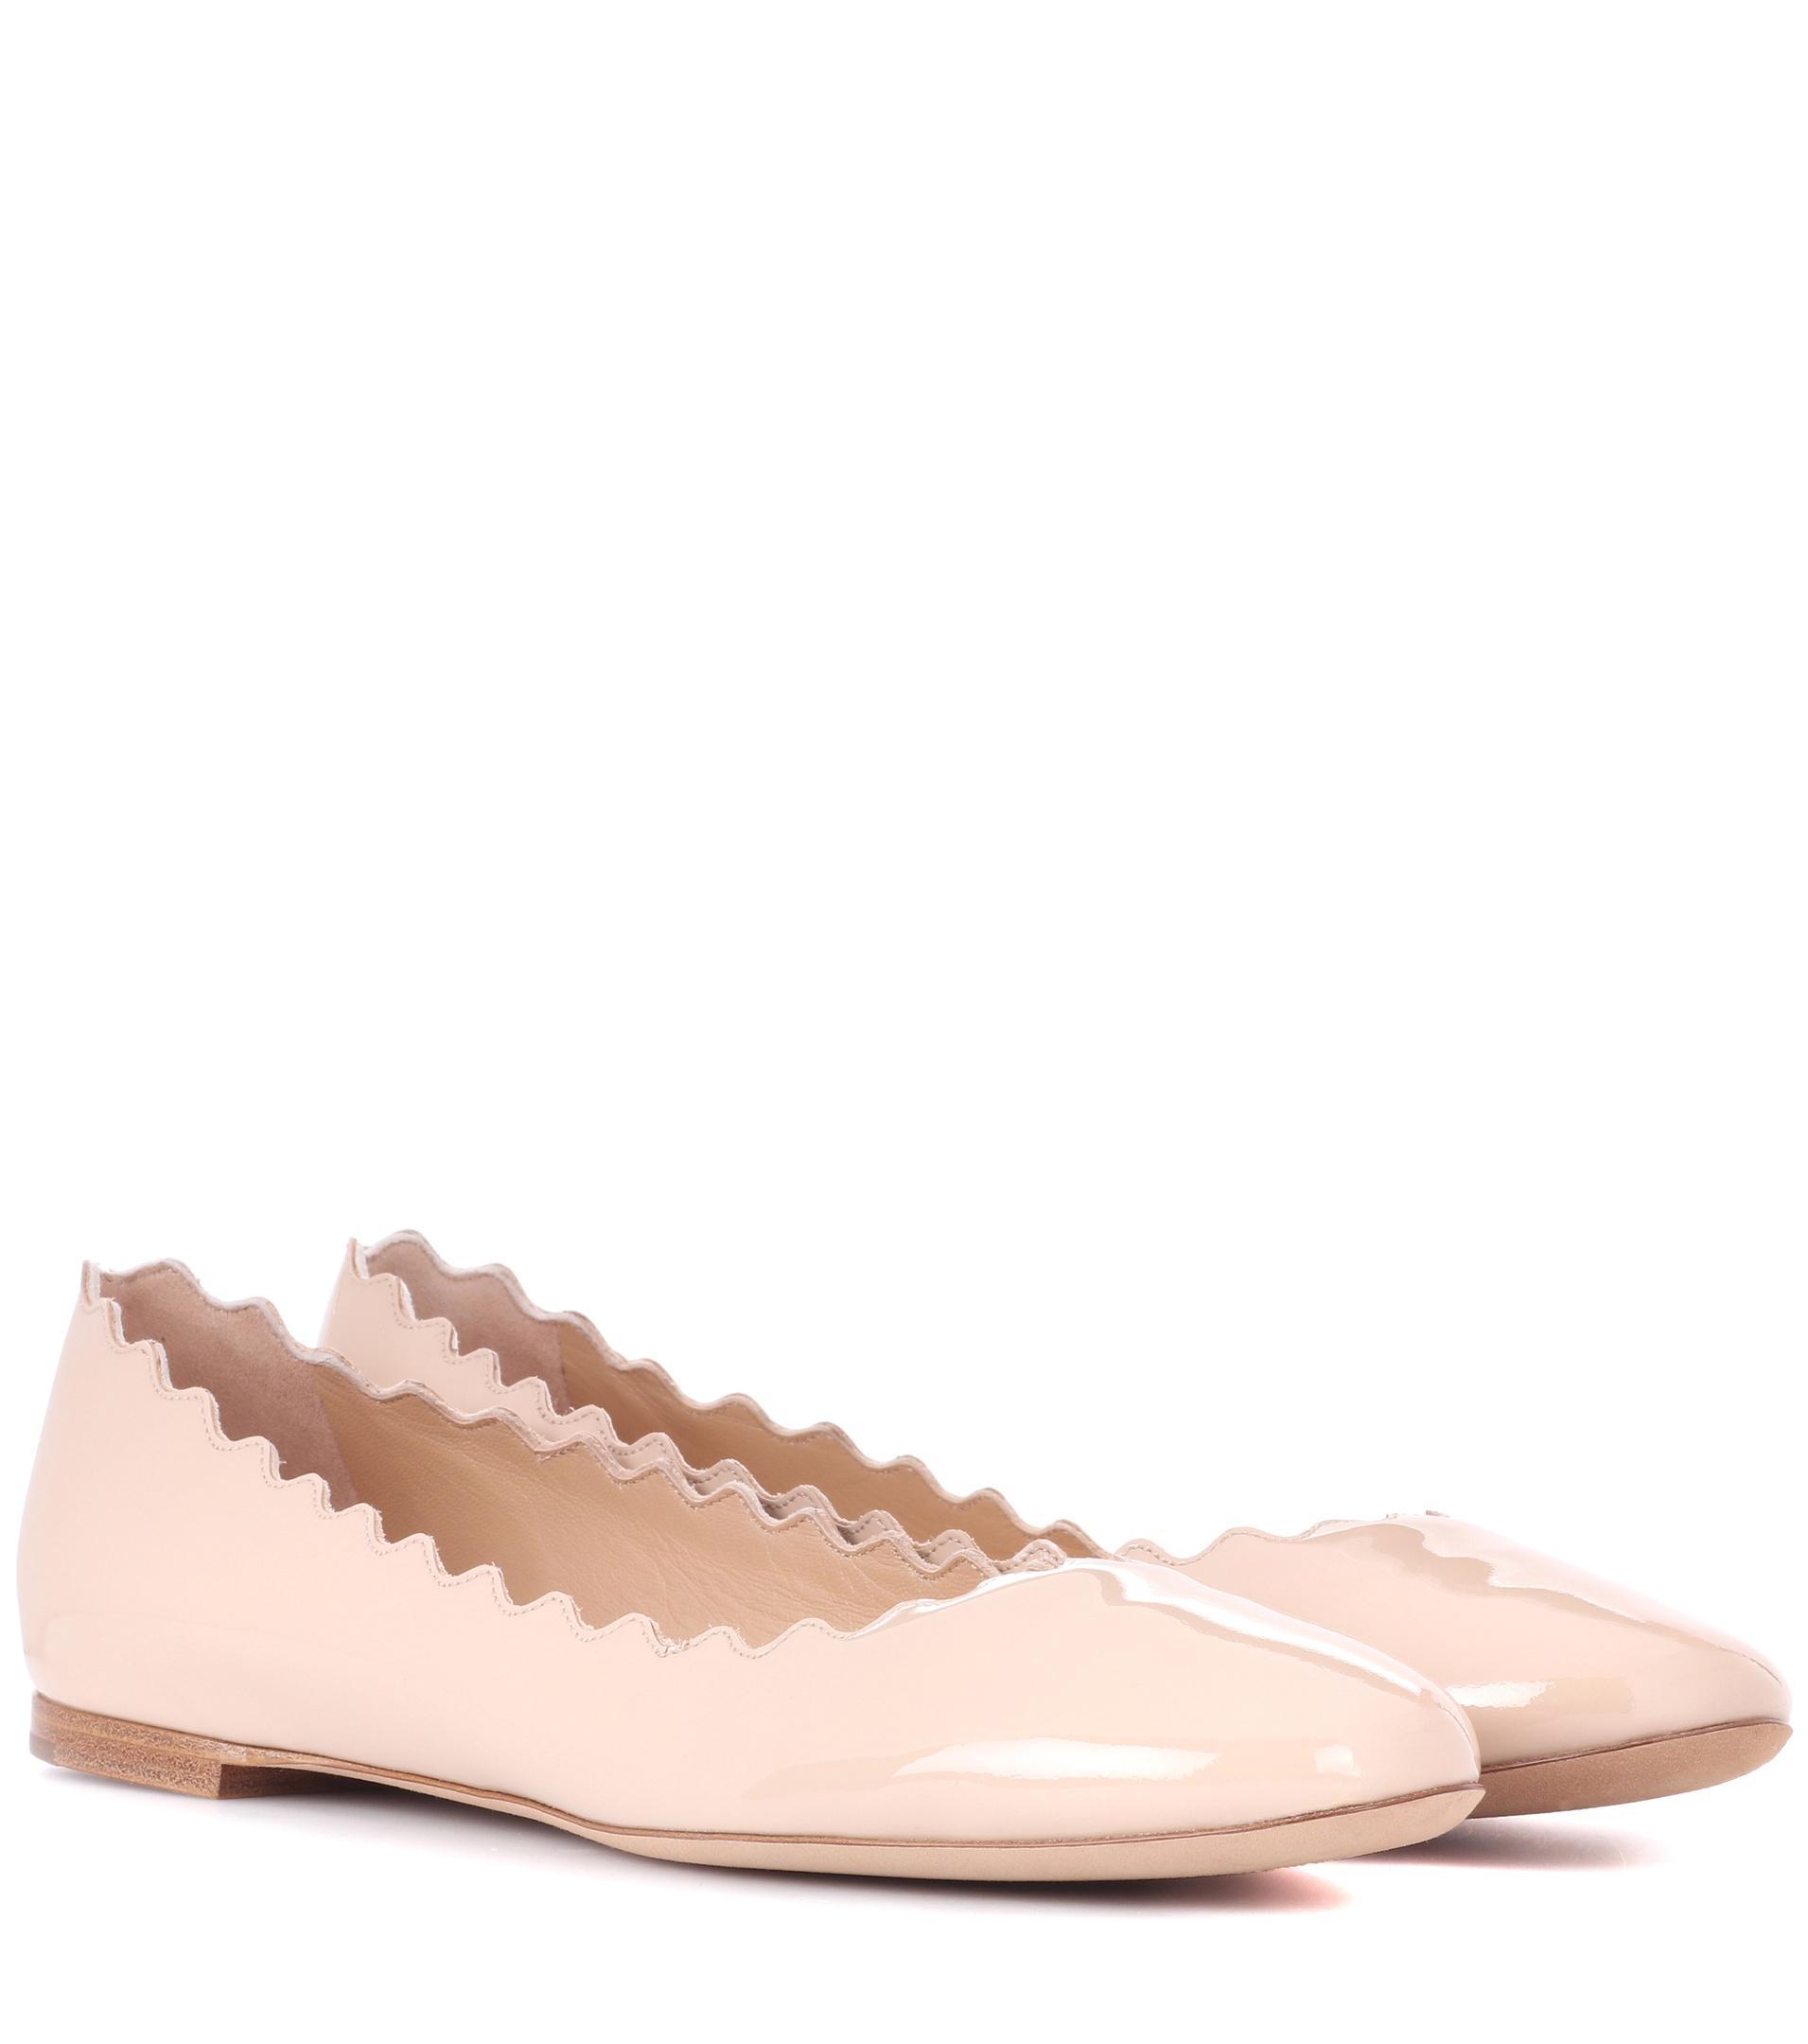 Lauren patent leather ballerinas Chloé pR74mfAr4